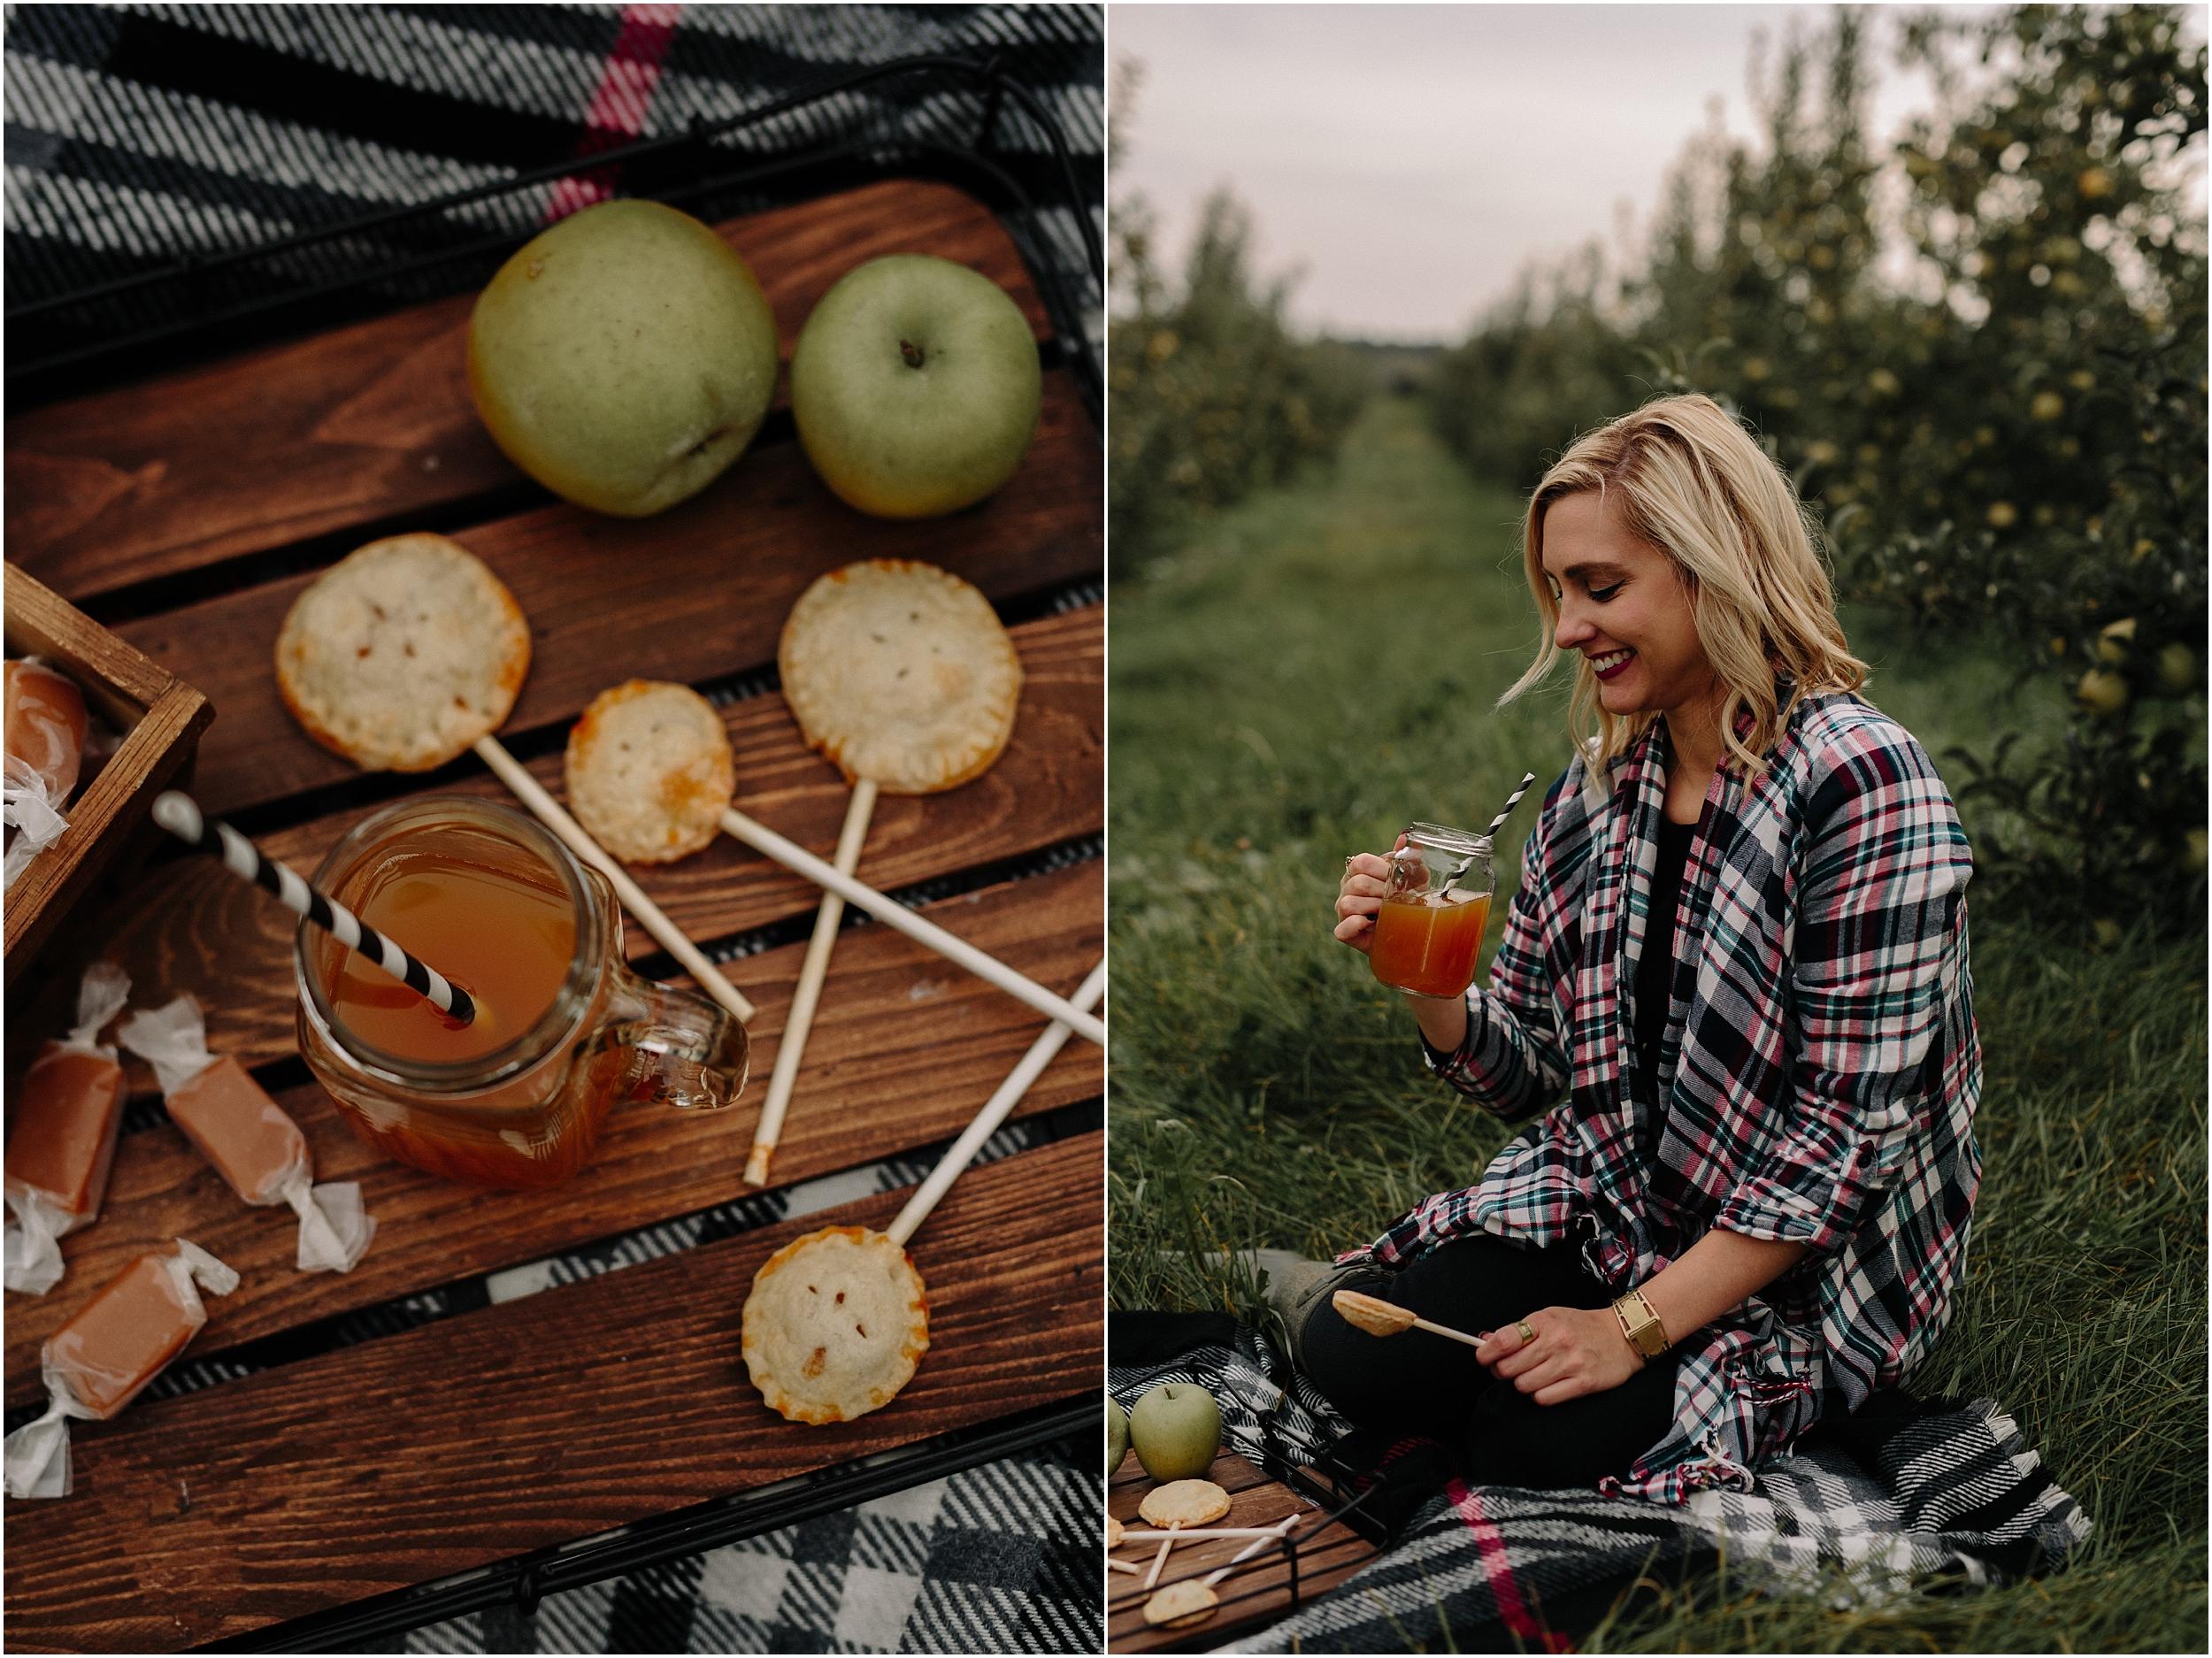 garwood.apple.orchard-11.jpg